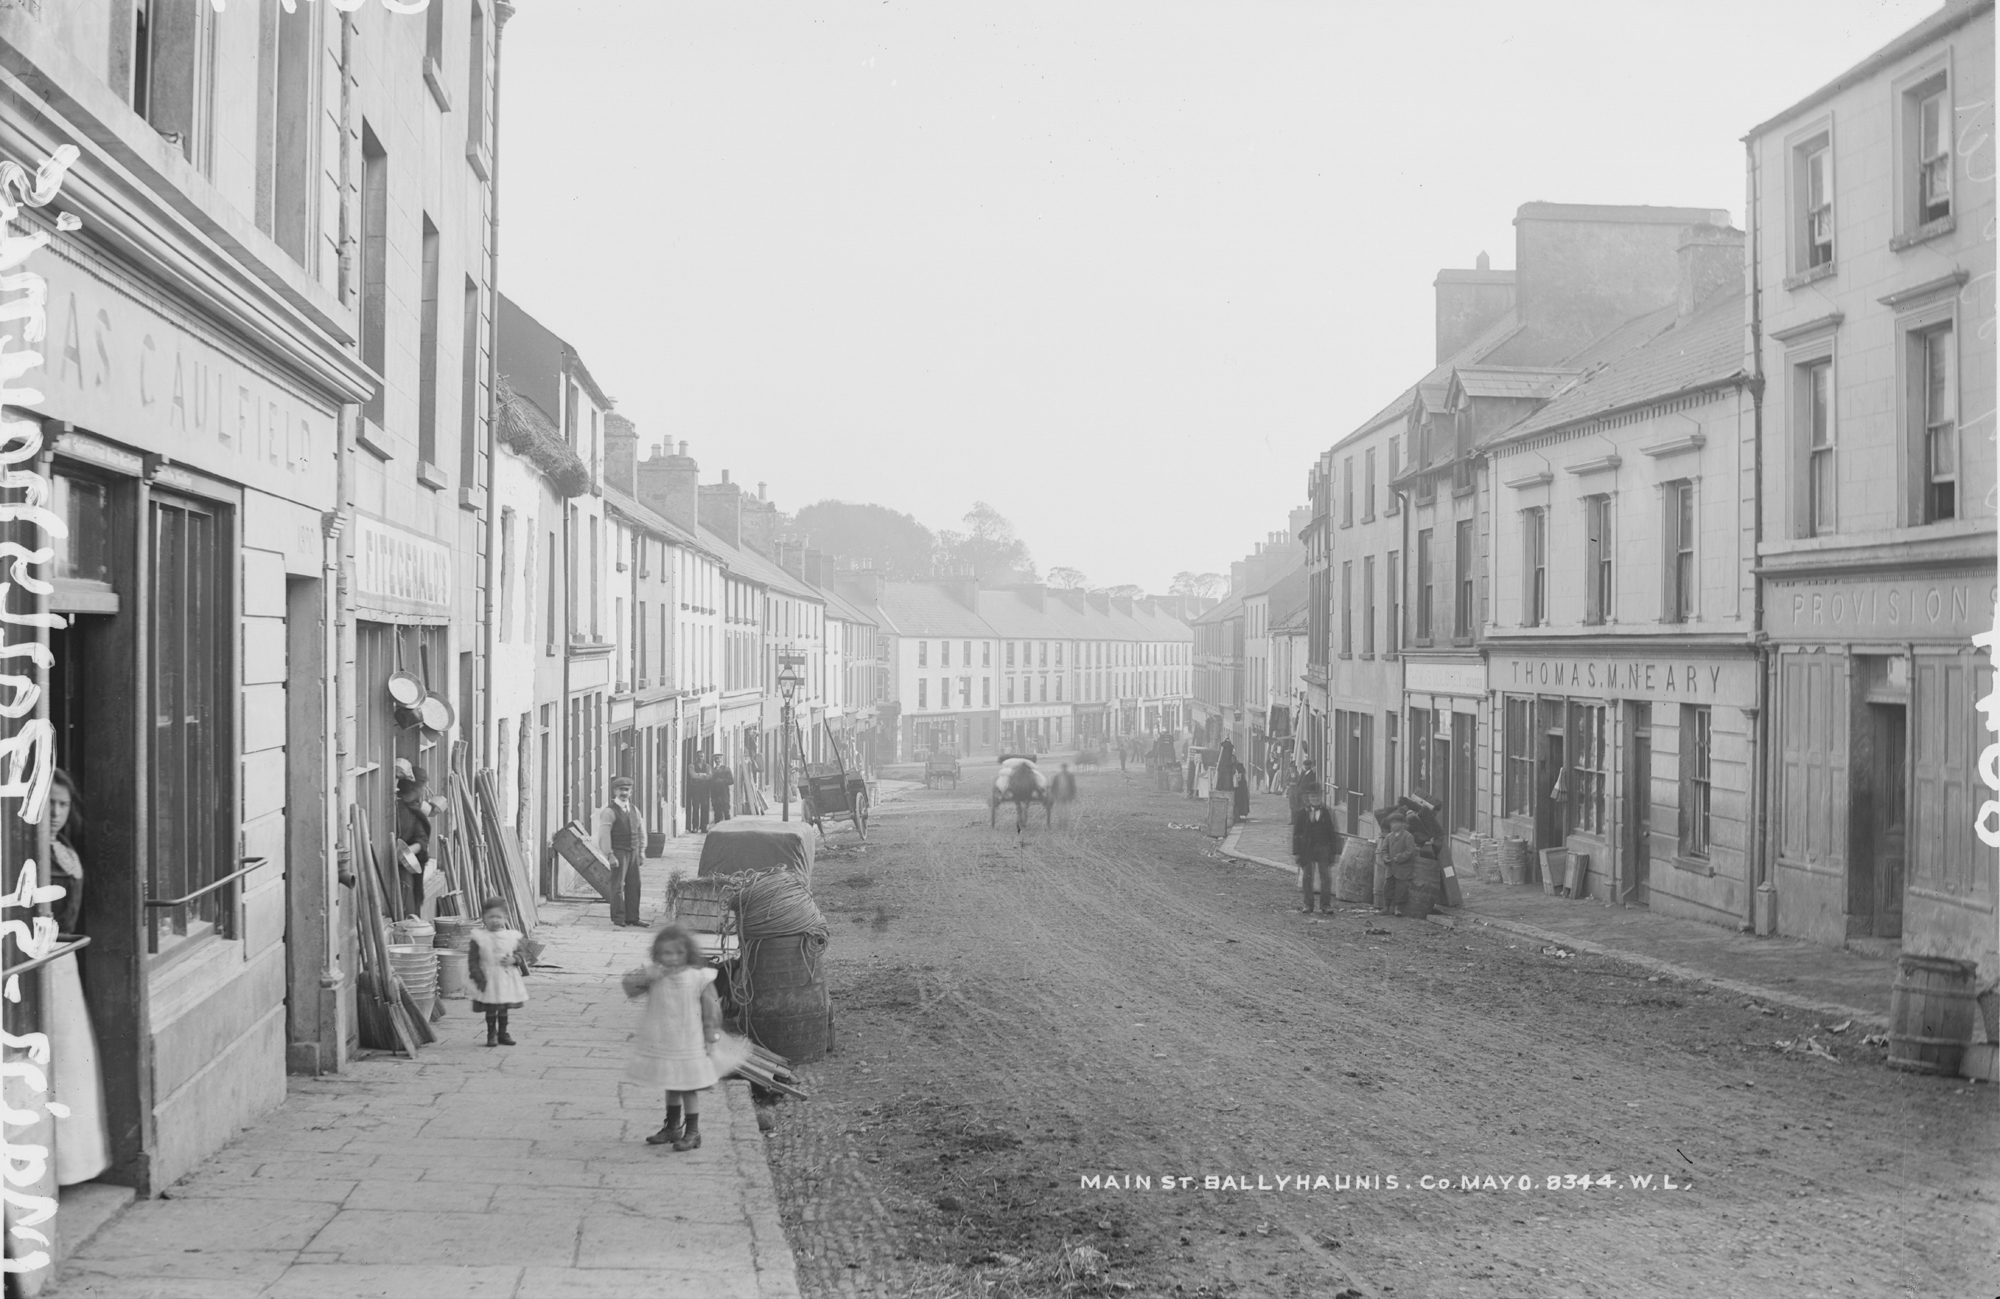 Main Street, Ballyhaunis, Co. Mayo